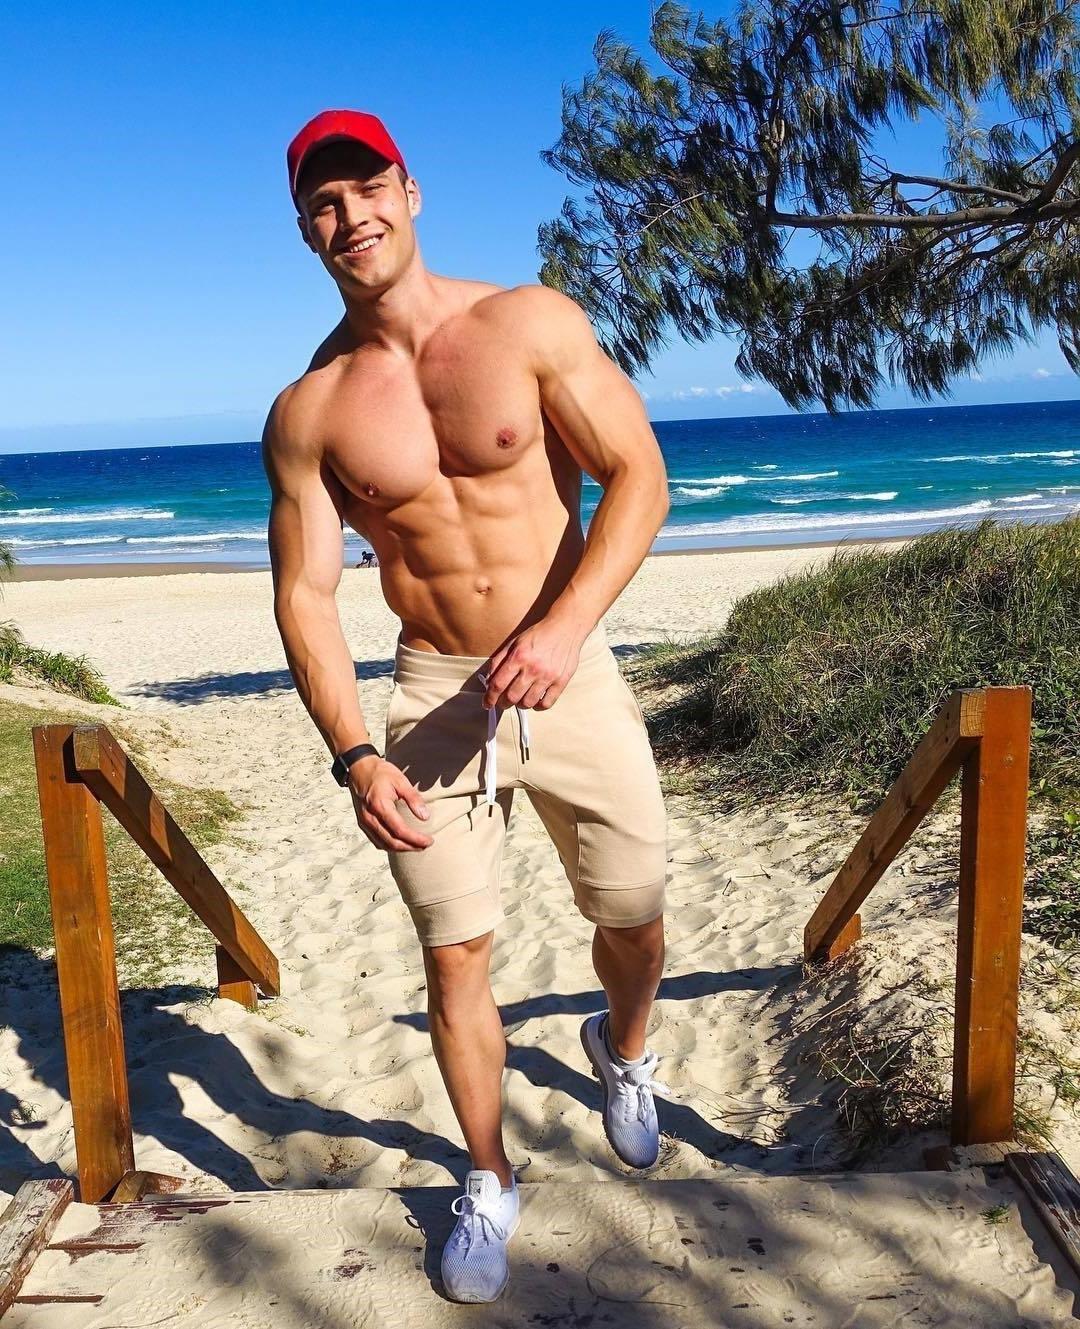 cute-swole-bare-chest-muscle-bro-cap-jay-darko-beach